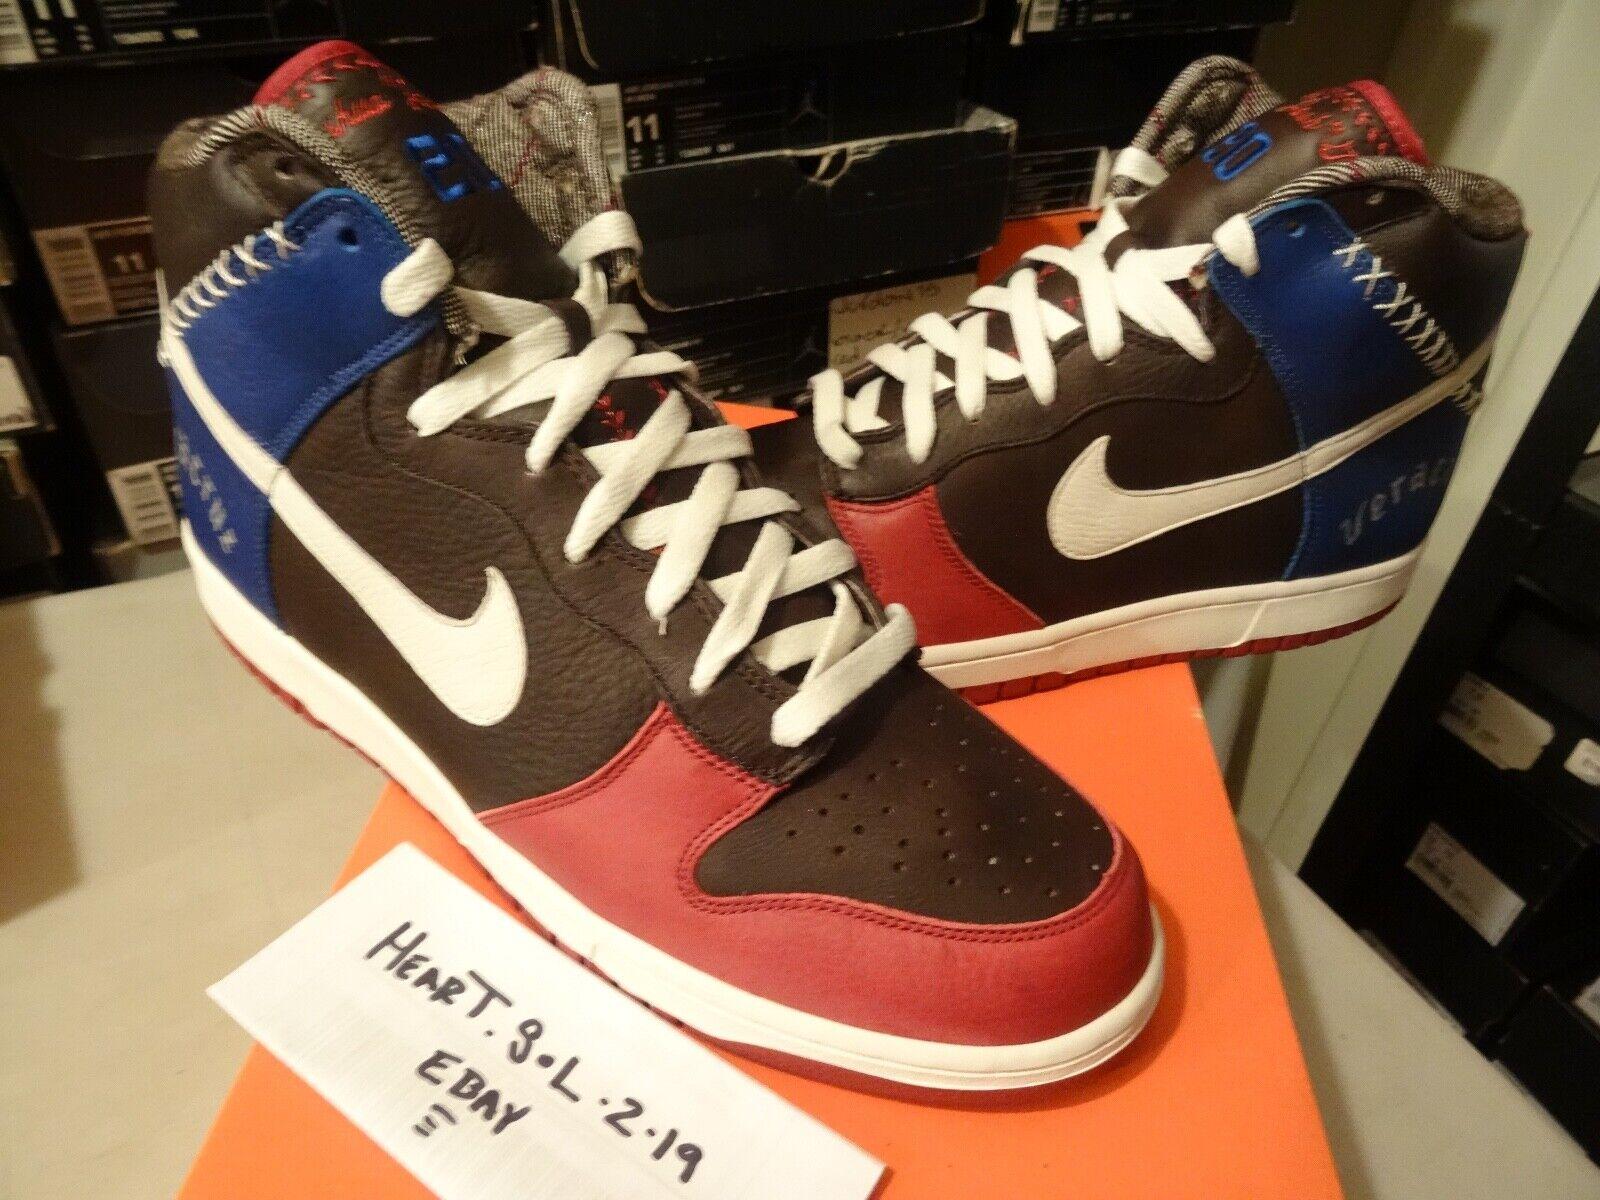 2006 Nike Dunk SB High Premium UTT  Latin Legacy  Untold Truth 313462 611 SZ 13